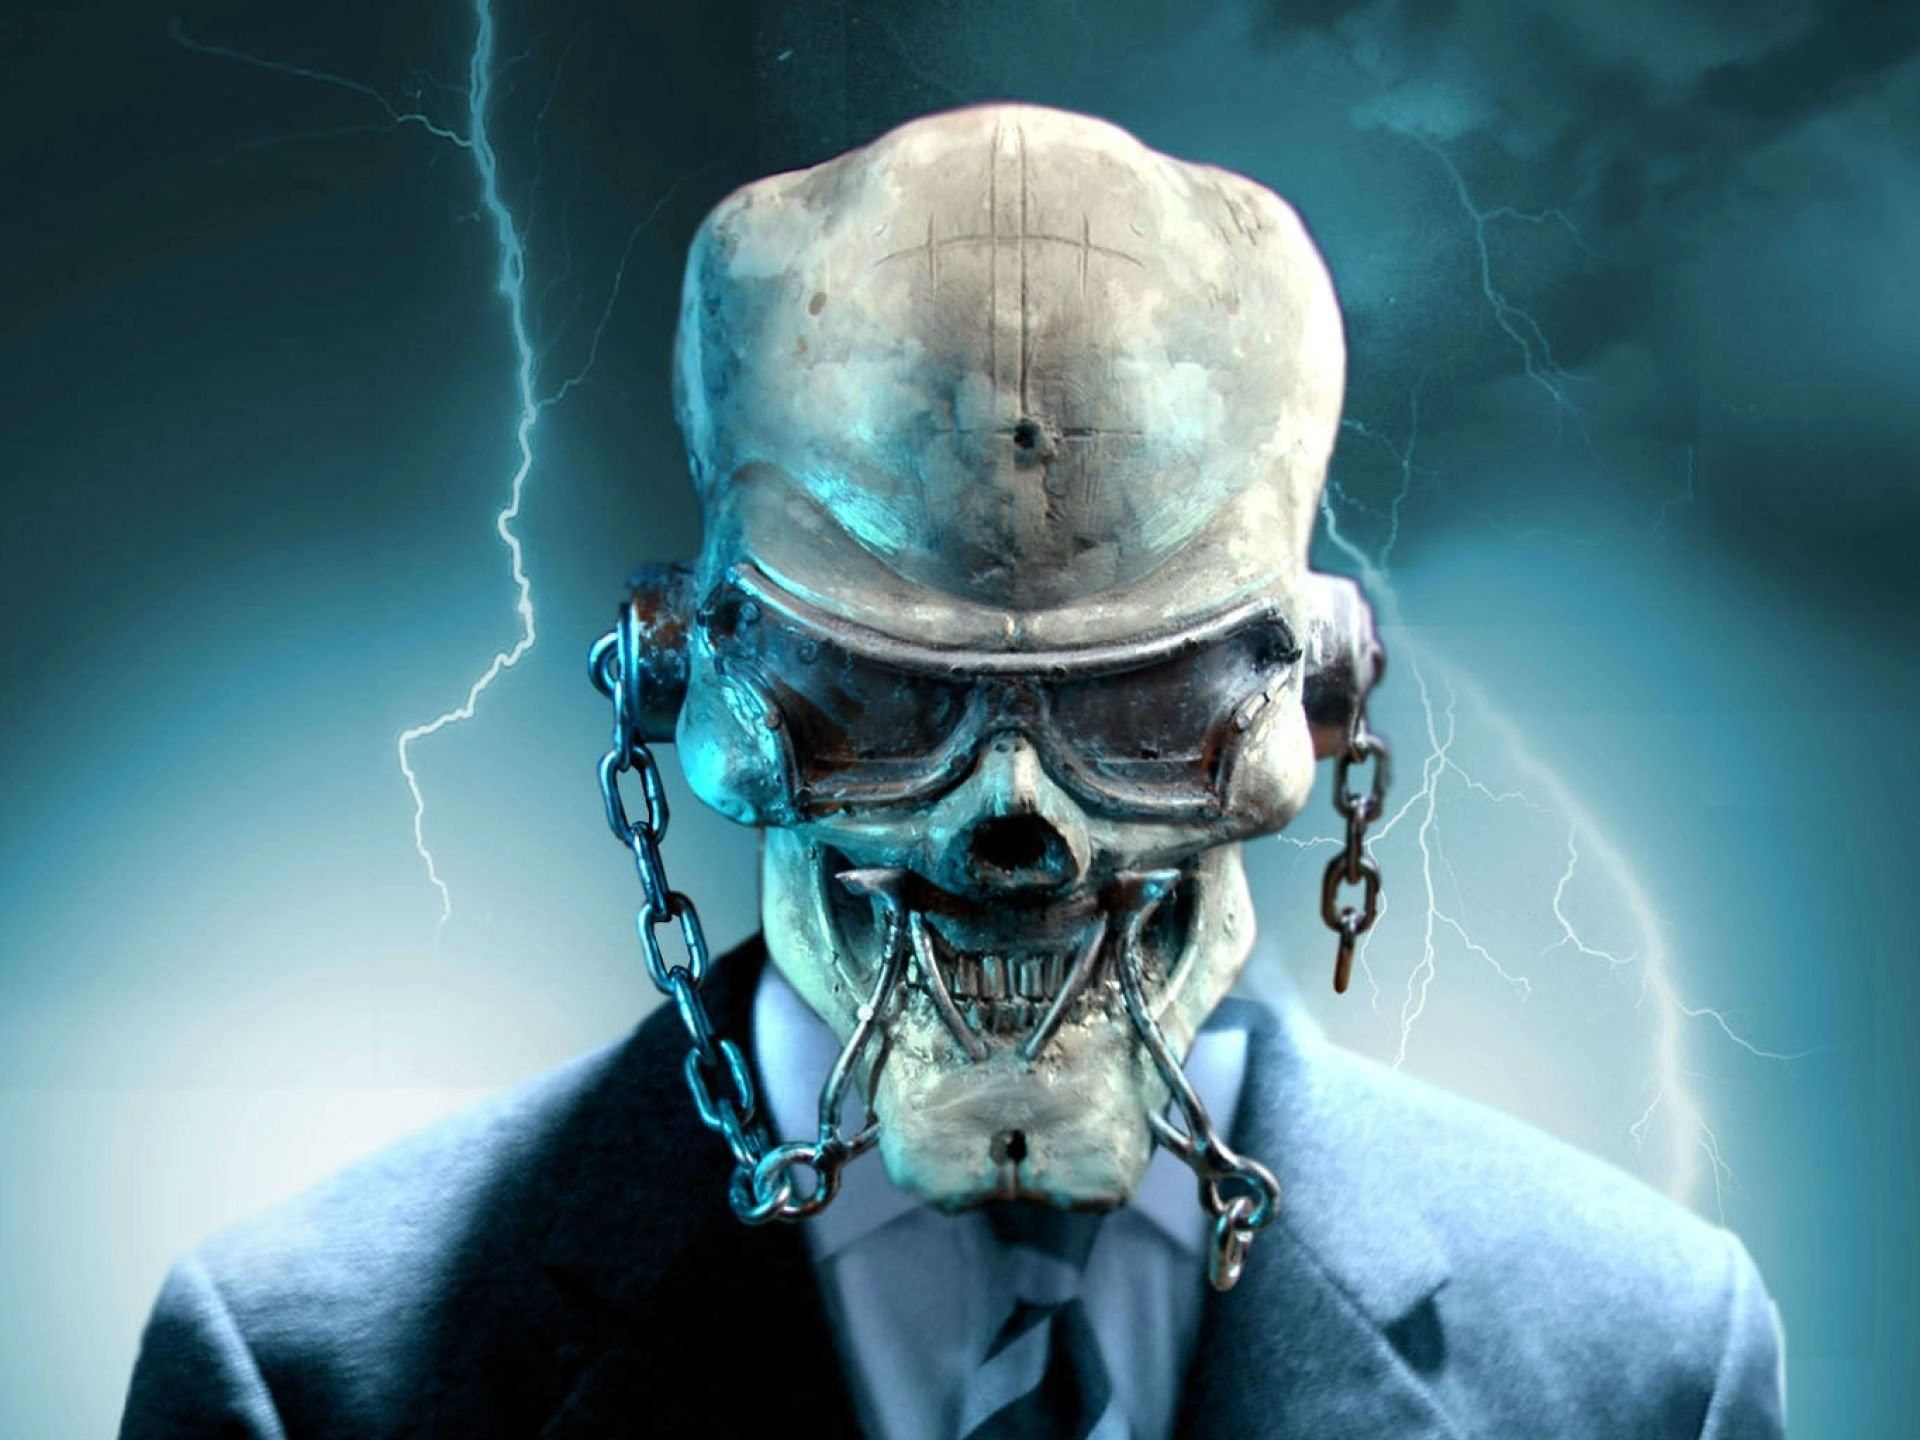 … hd backgrounds for; megadeth thrash metal heavy poster dark skull f  wallpaper …